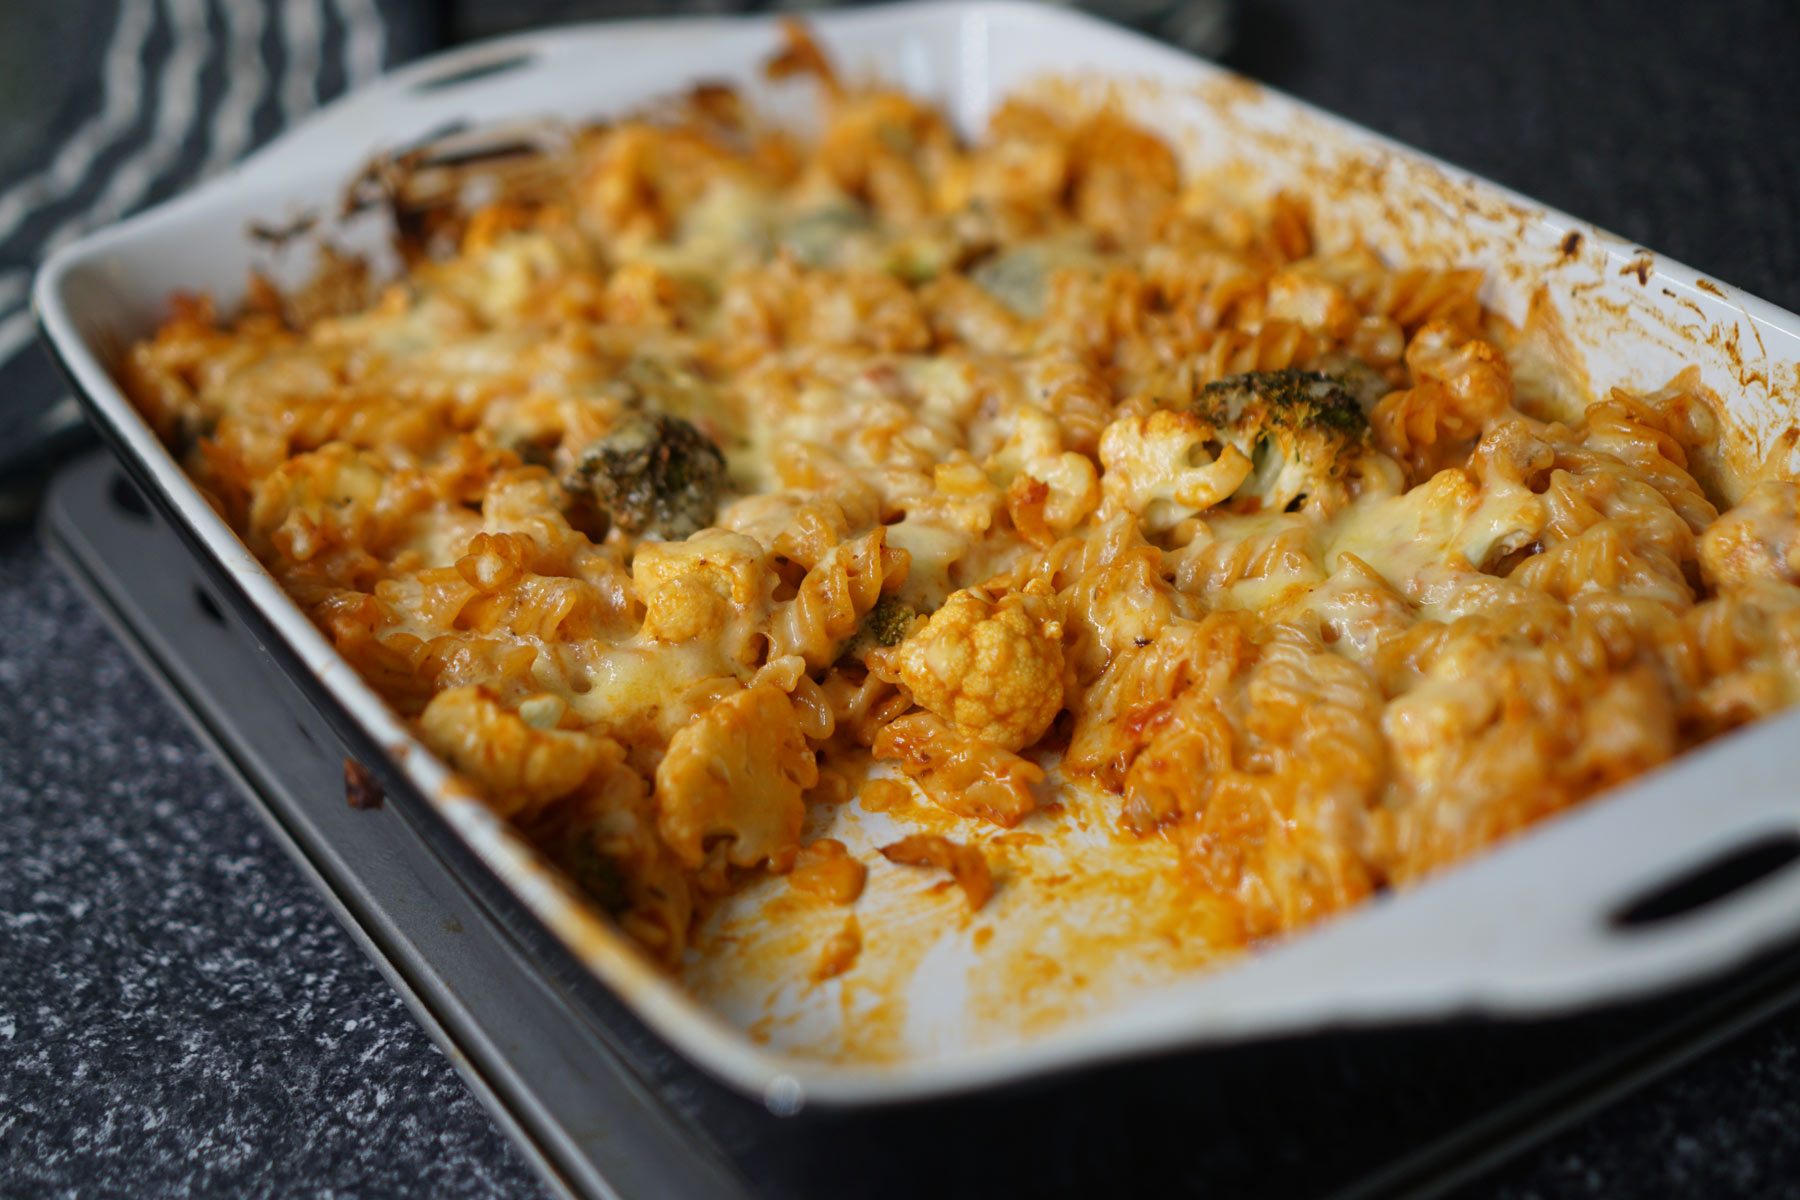 Cauliflower, Broccoli & Tuna Pasta Bake